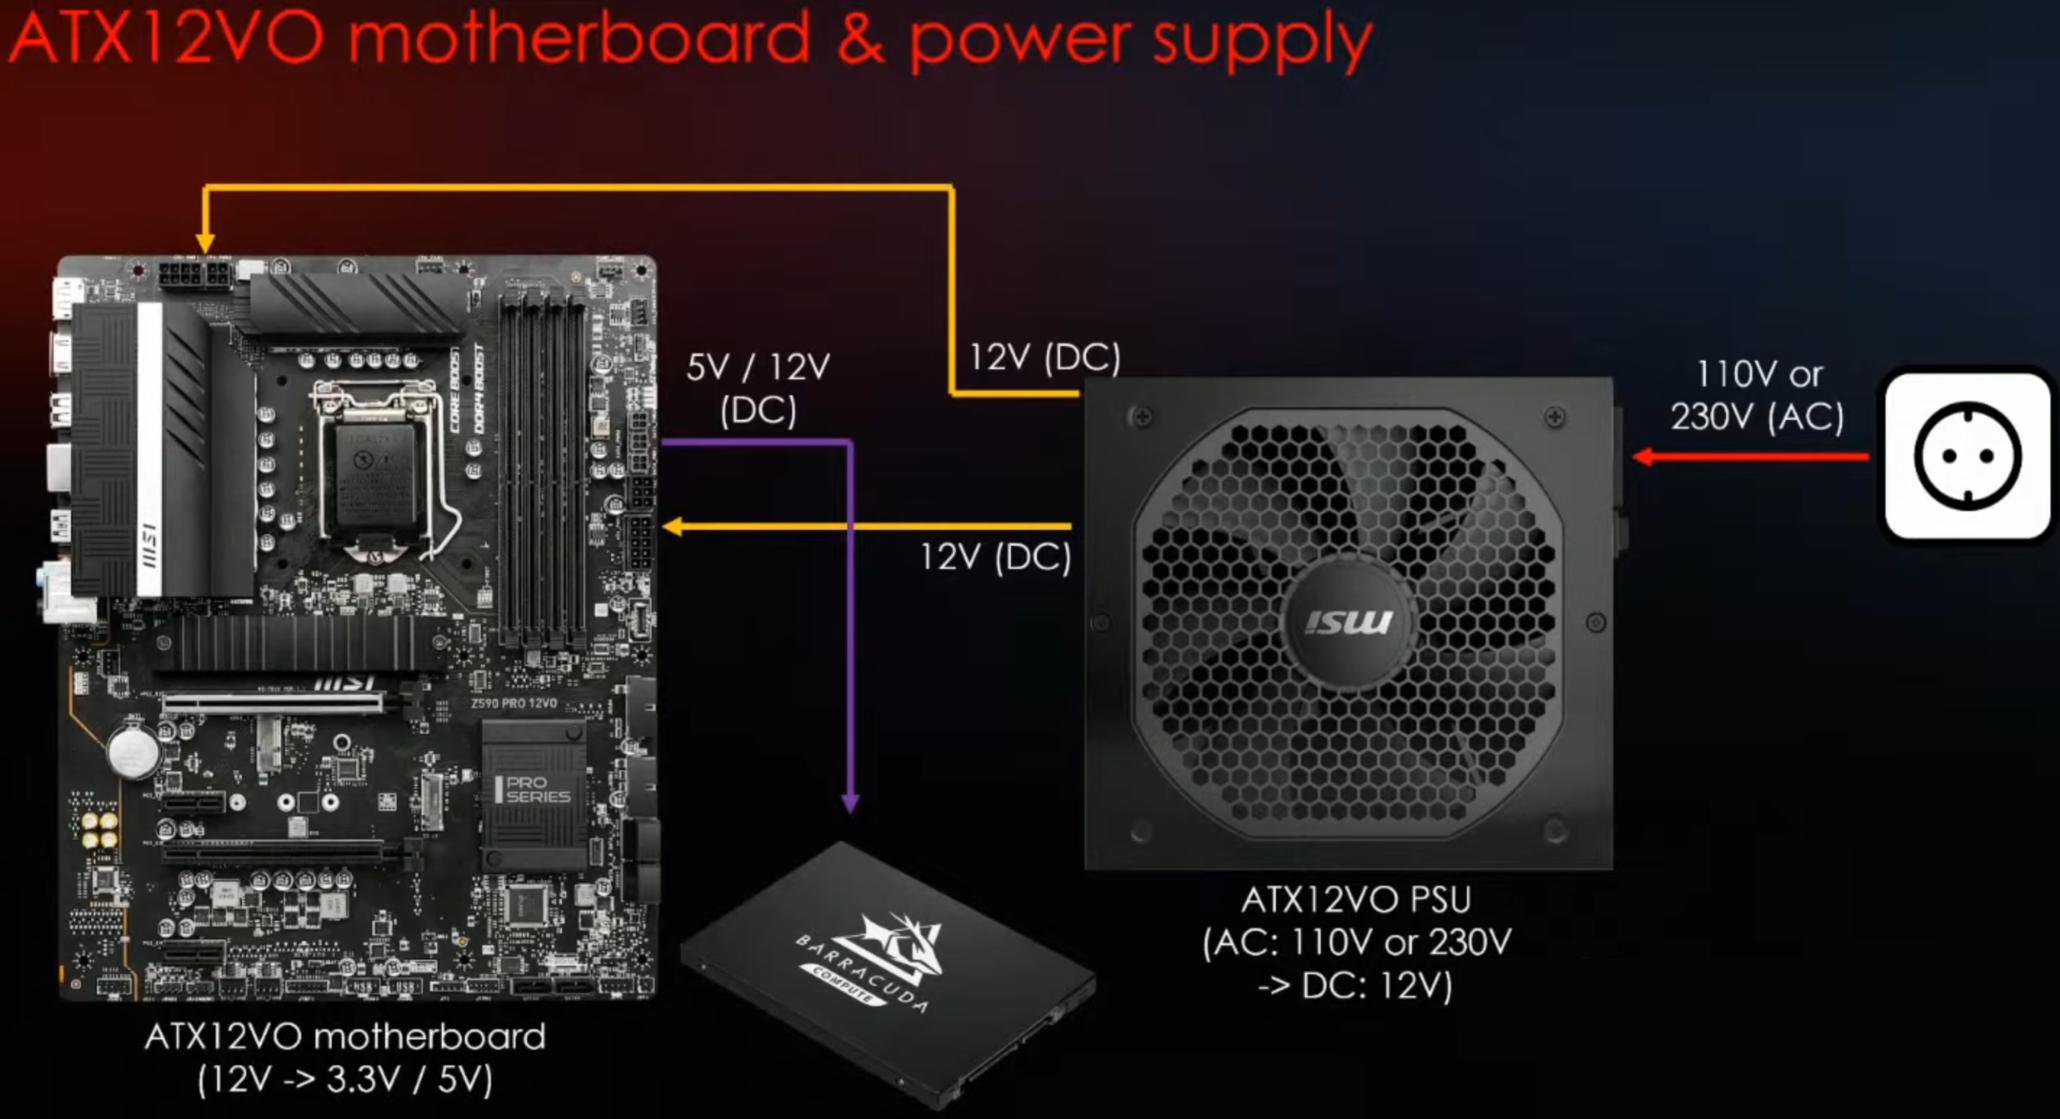 MSI Z590 Intel ATX12VO